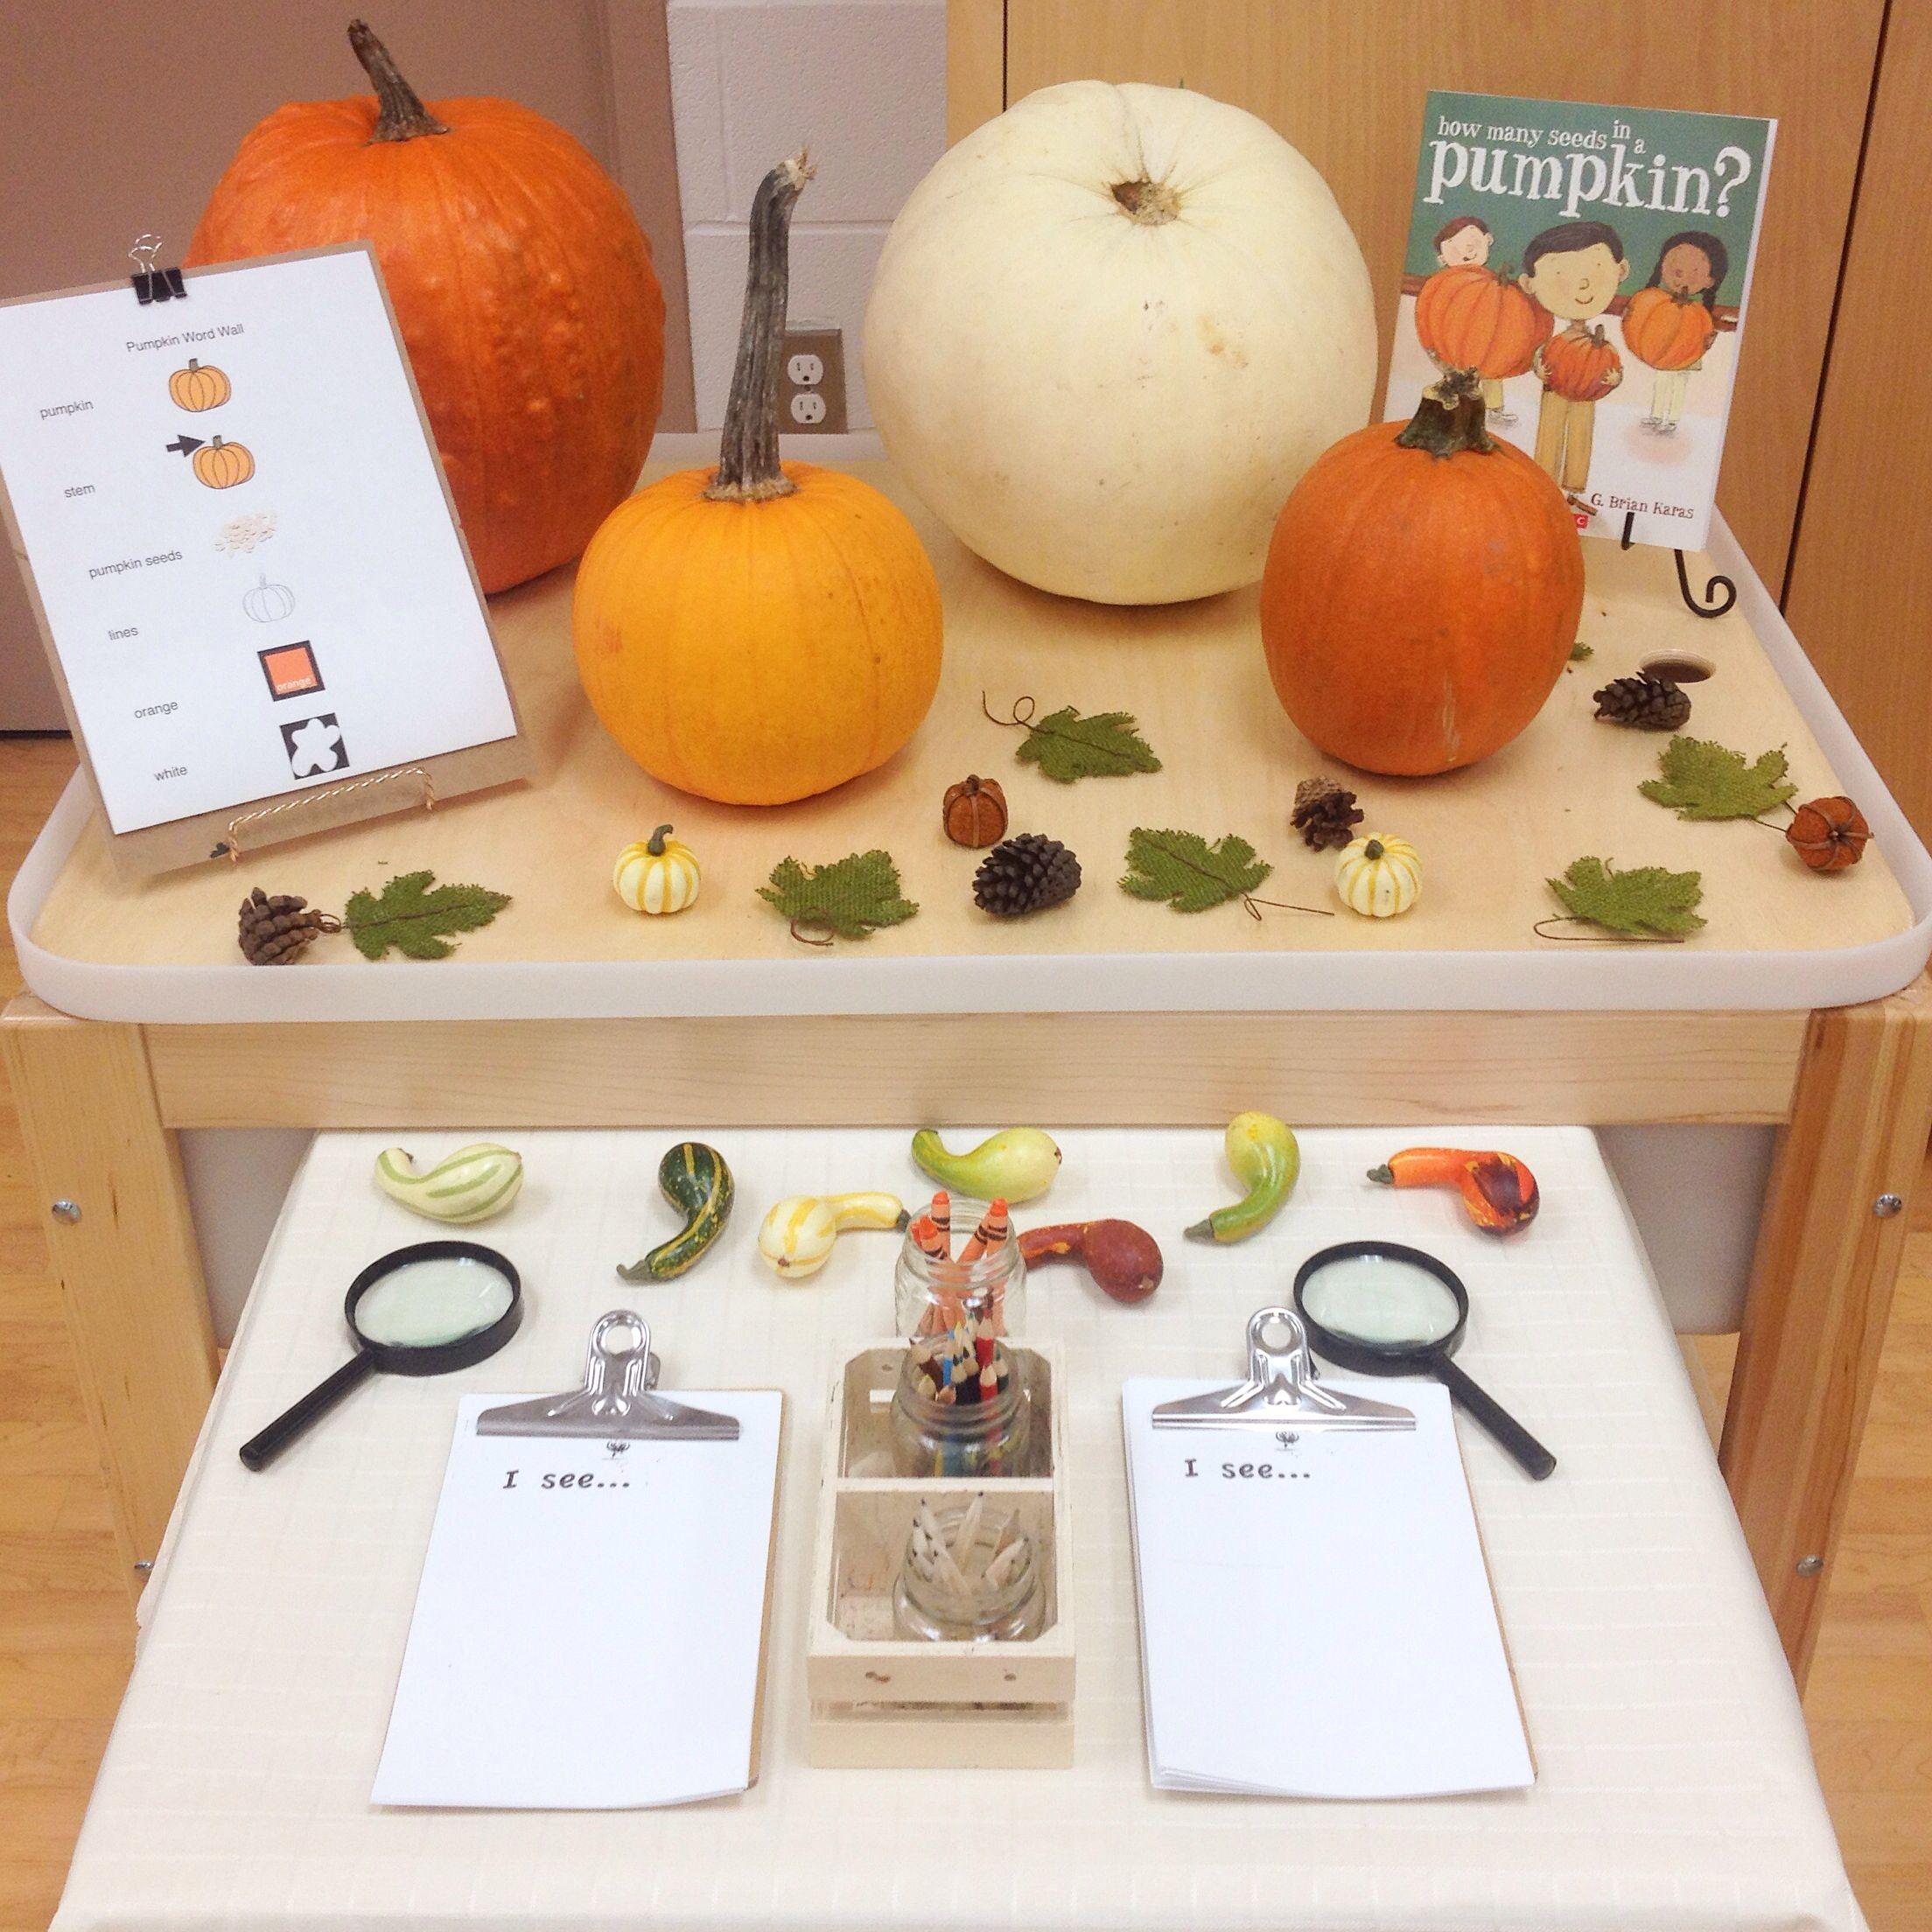 Pumpkin Provocation